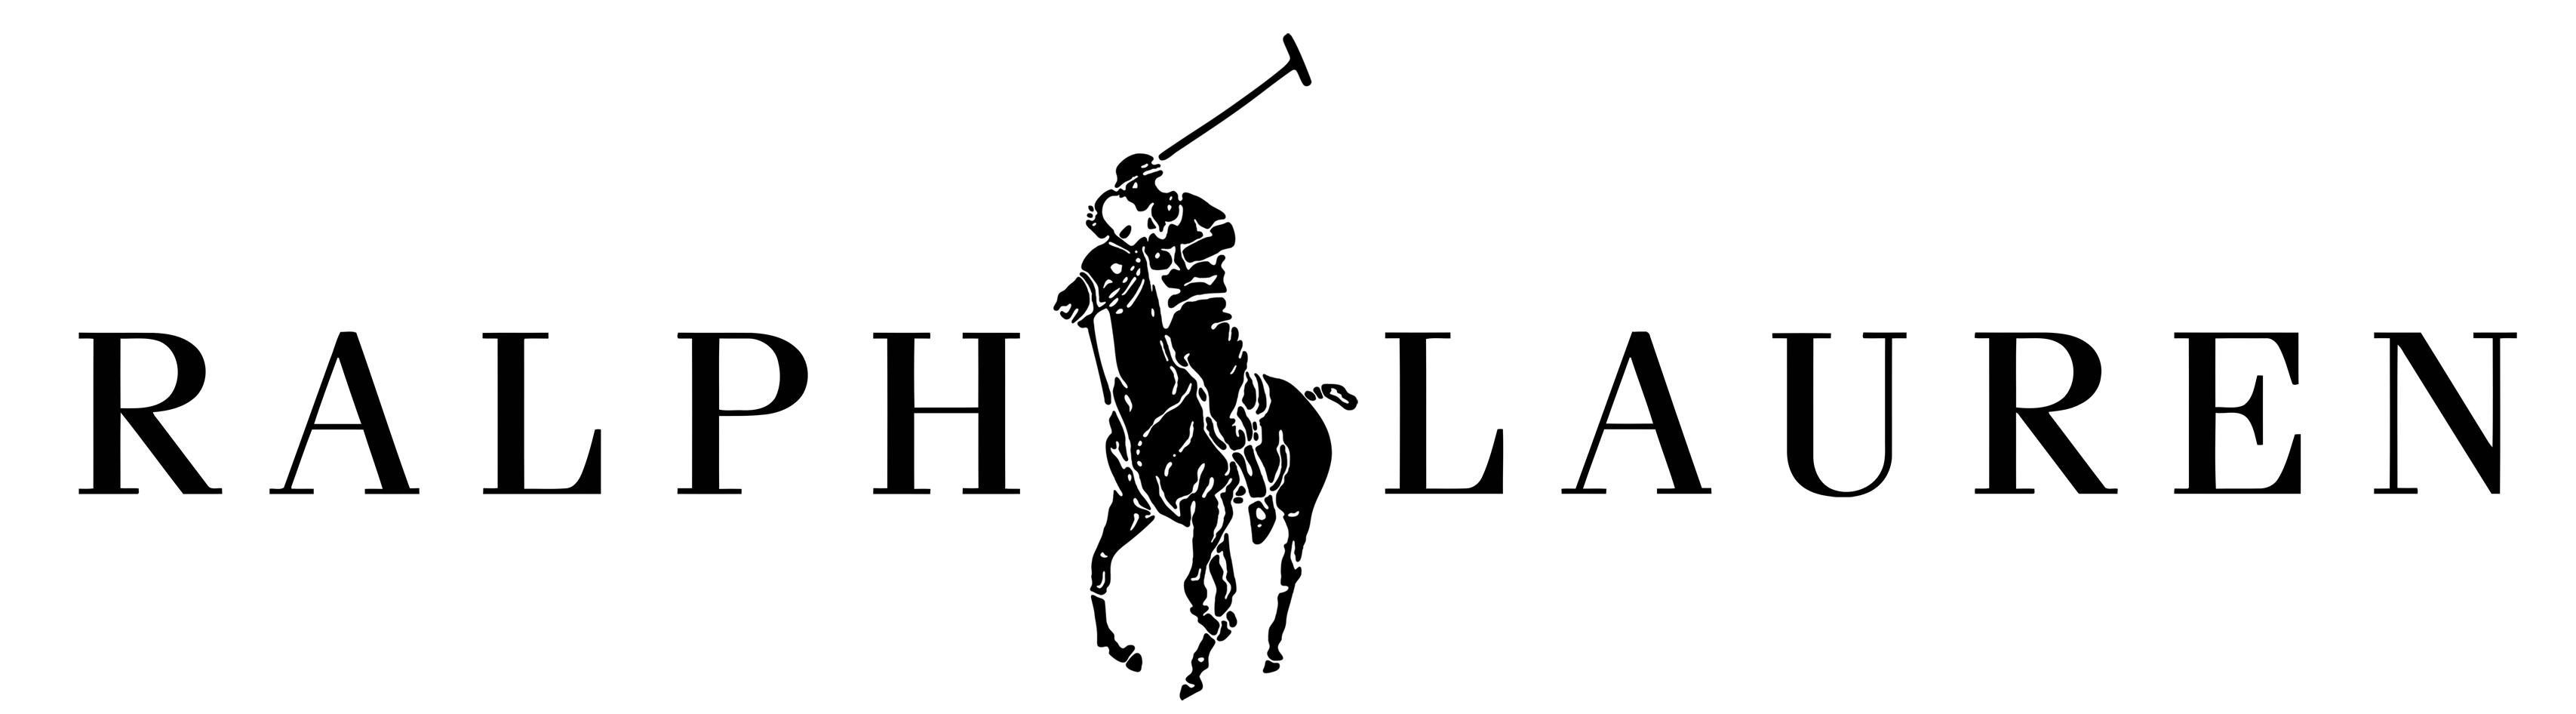 Ralph lauren logo ralph lauren symbol meaning history and evolution emblem ralph lauren biocorpaavc Images